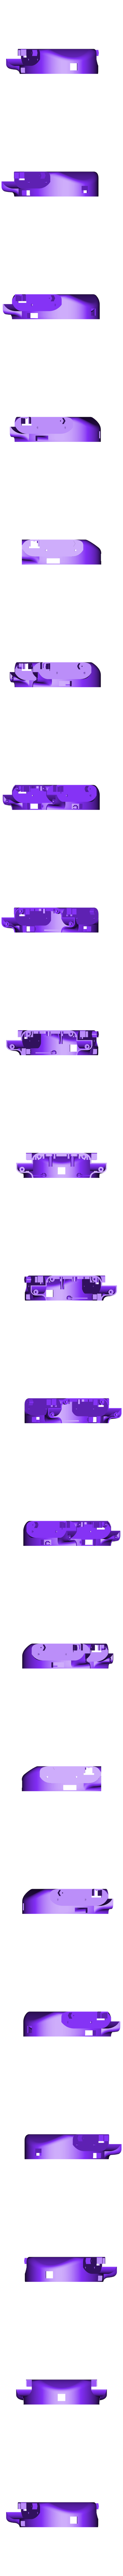 Lower_8.1.stl Download free STL file Simula 5 Robot Developers Kit • 3D printable model, JamieLaing